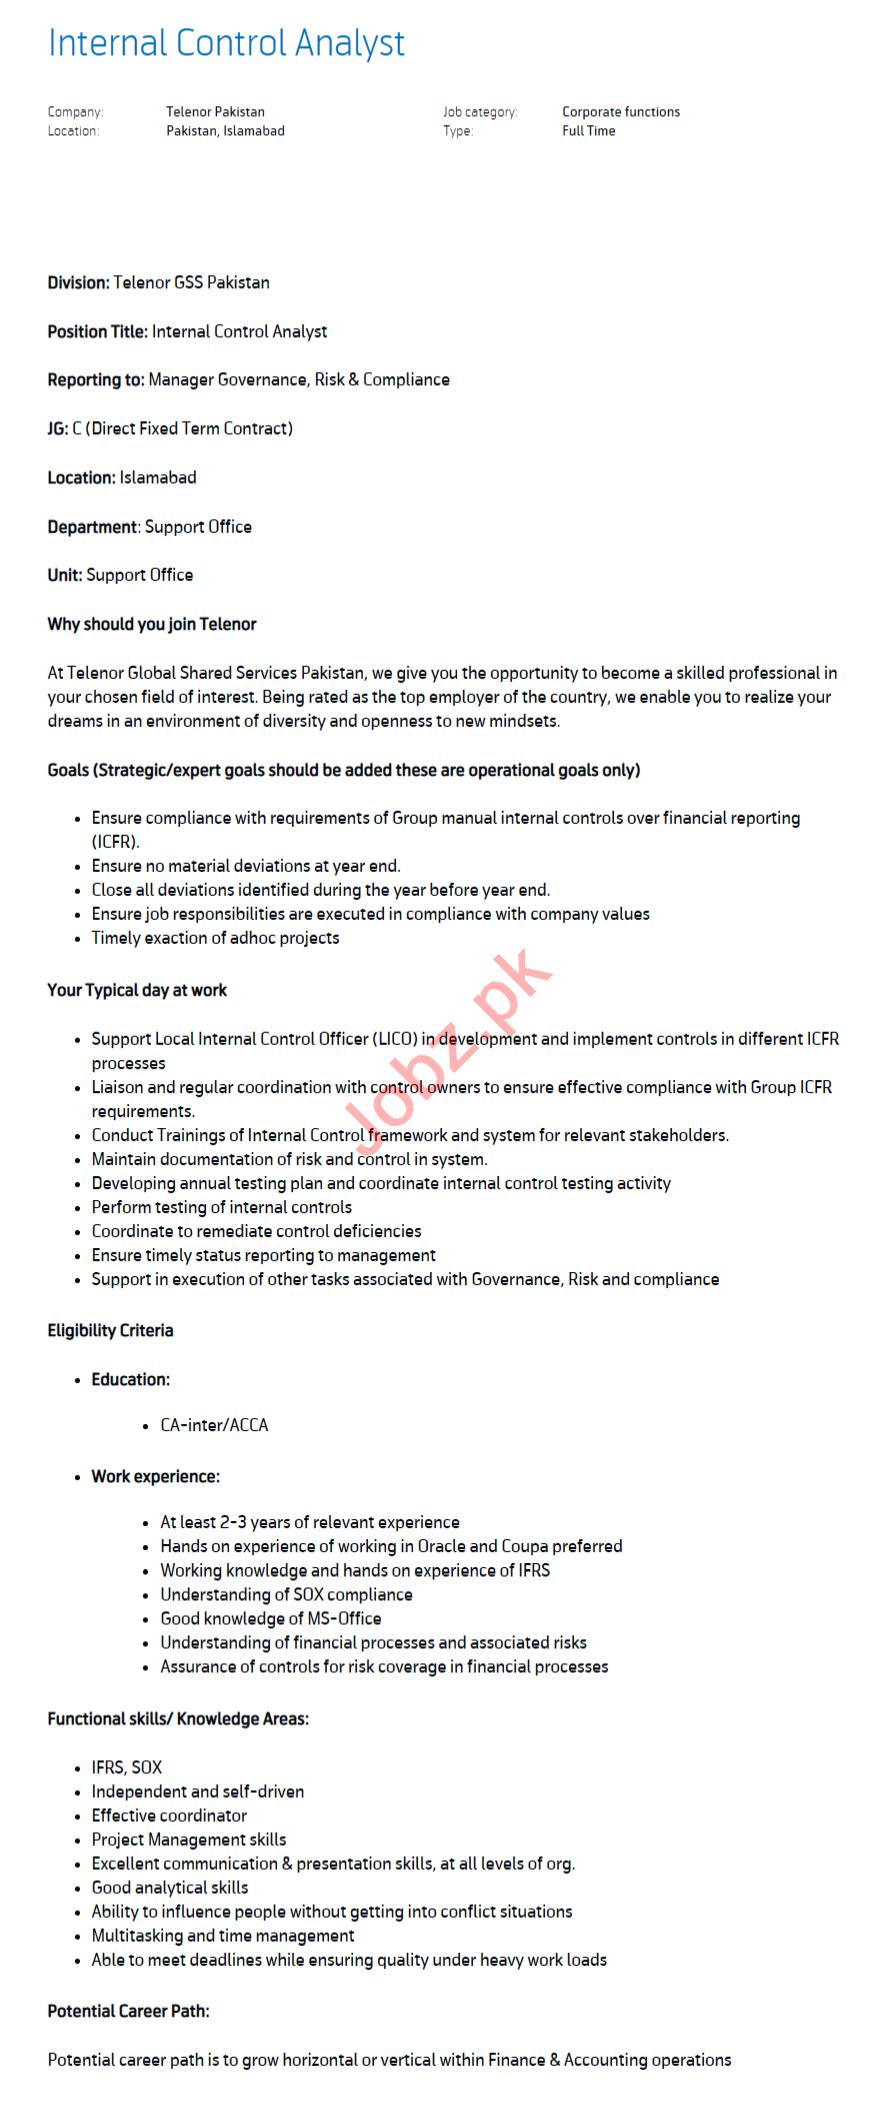 Internal Control Analyst Jobs 2020 in Islamabad